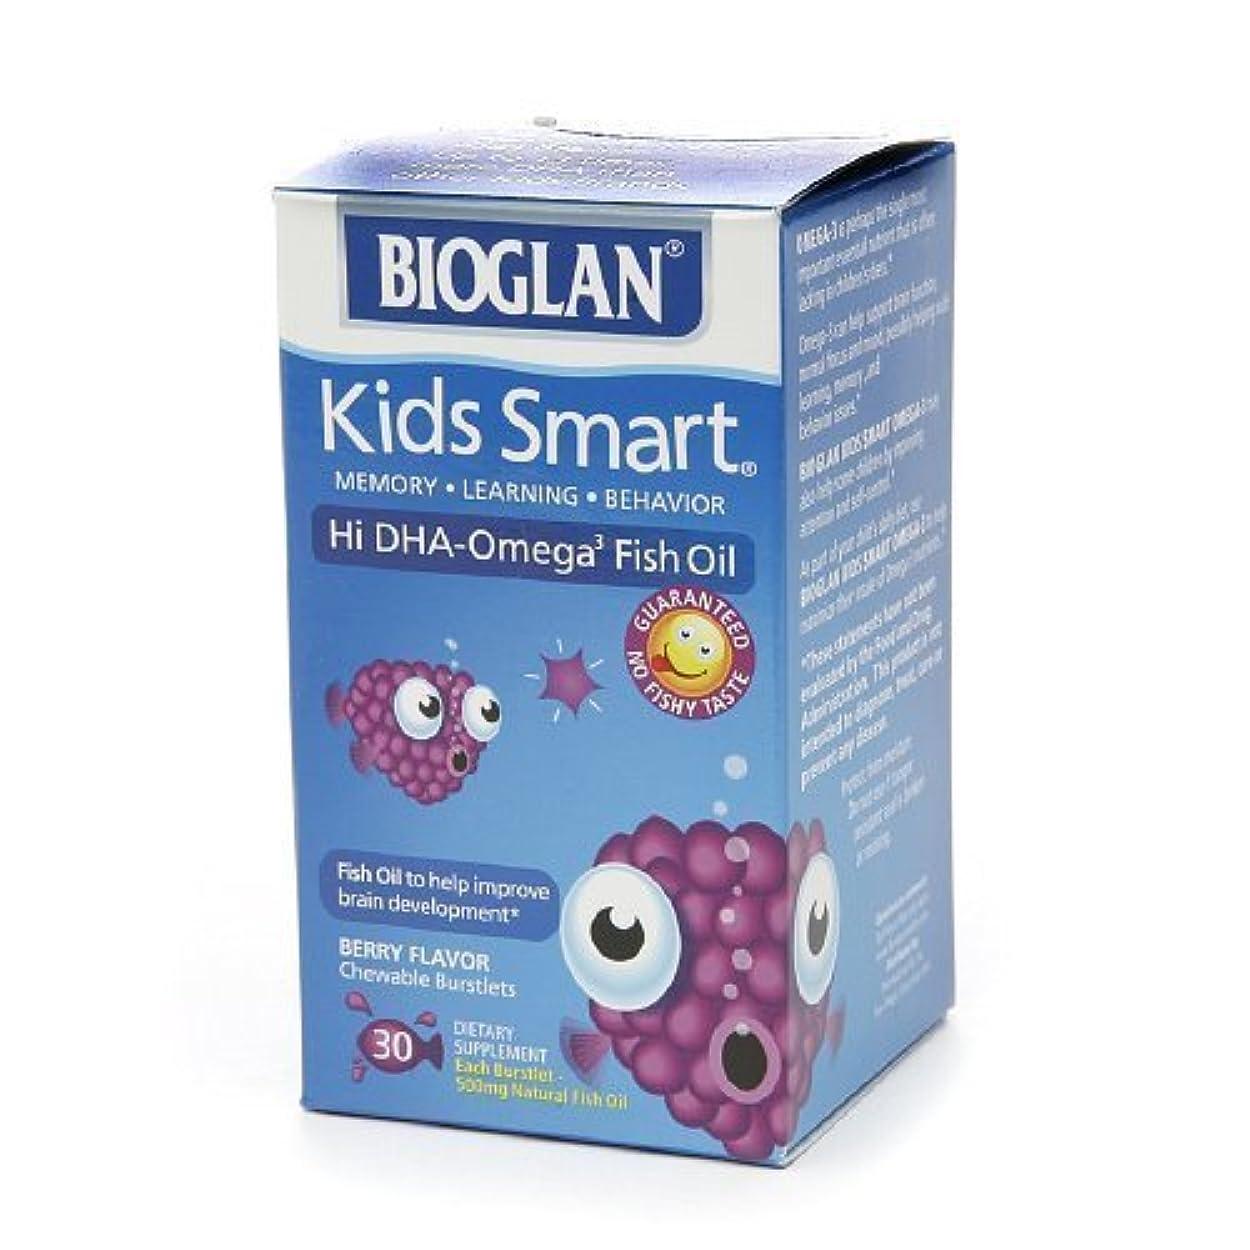 BioGlan Kids Smart Hi DHA Omega-3 Fish Oil, Chewable Burstlets, Berry--30 ea-Product ID DRU-318828_1 by bioglan...